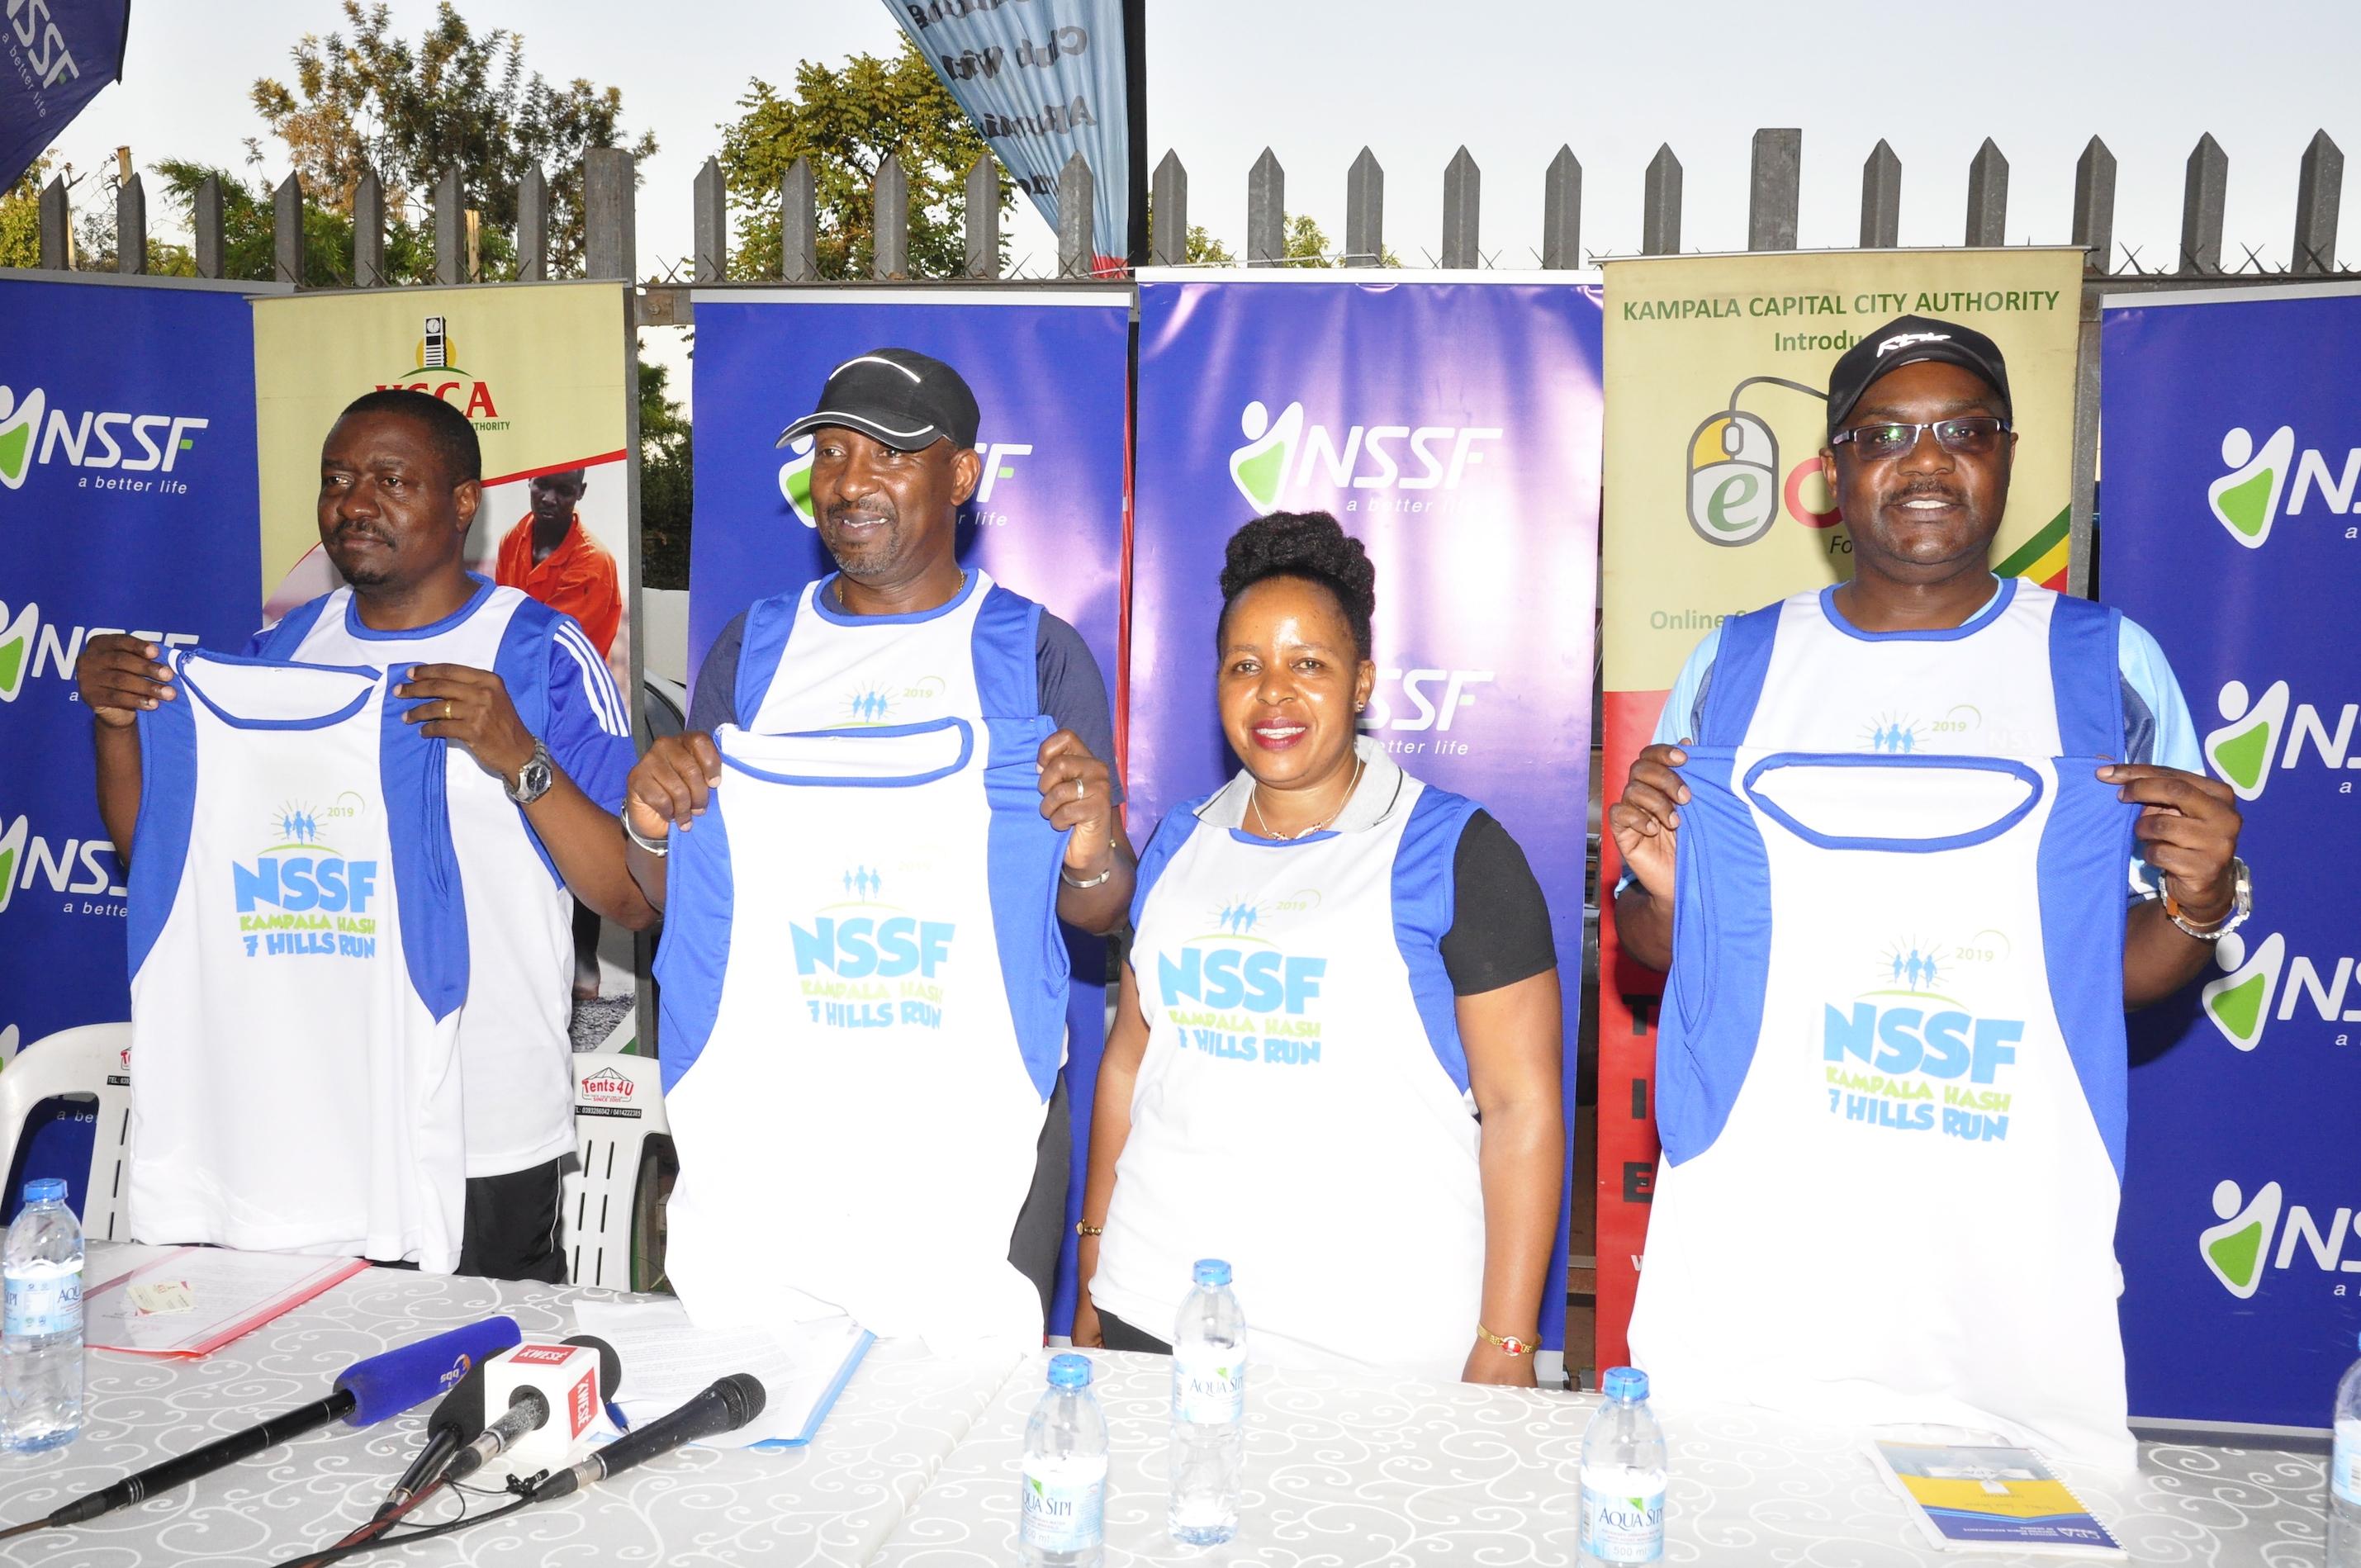 Kampala 7 Hills Hash Run launched